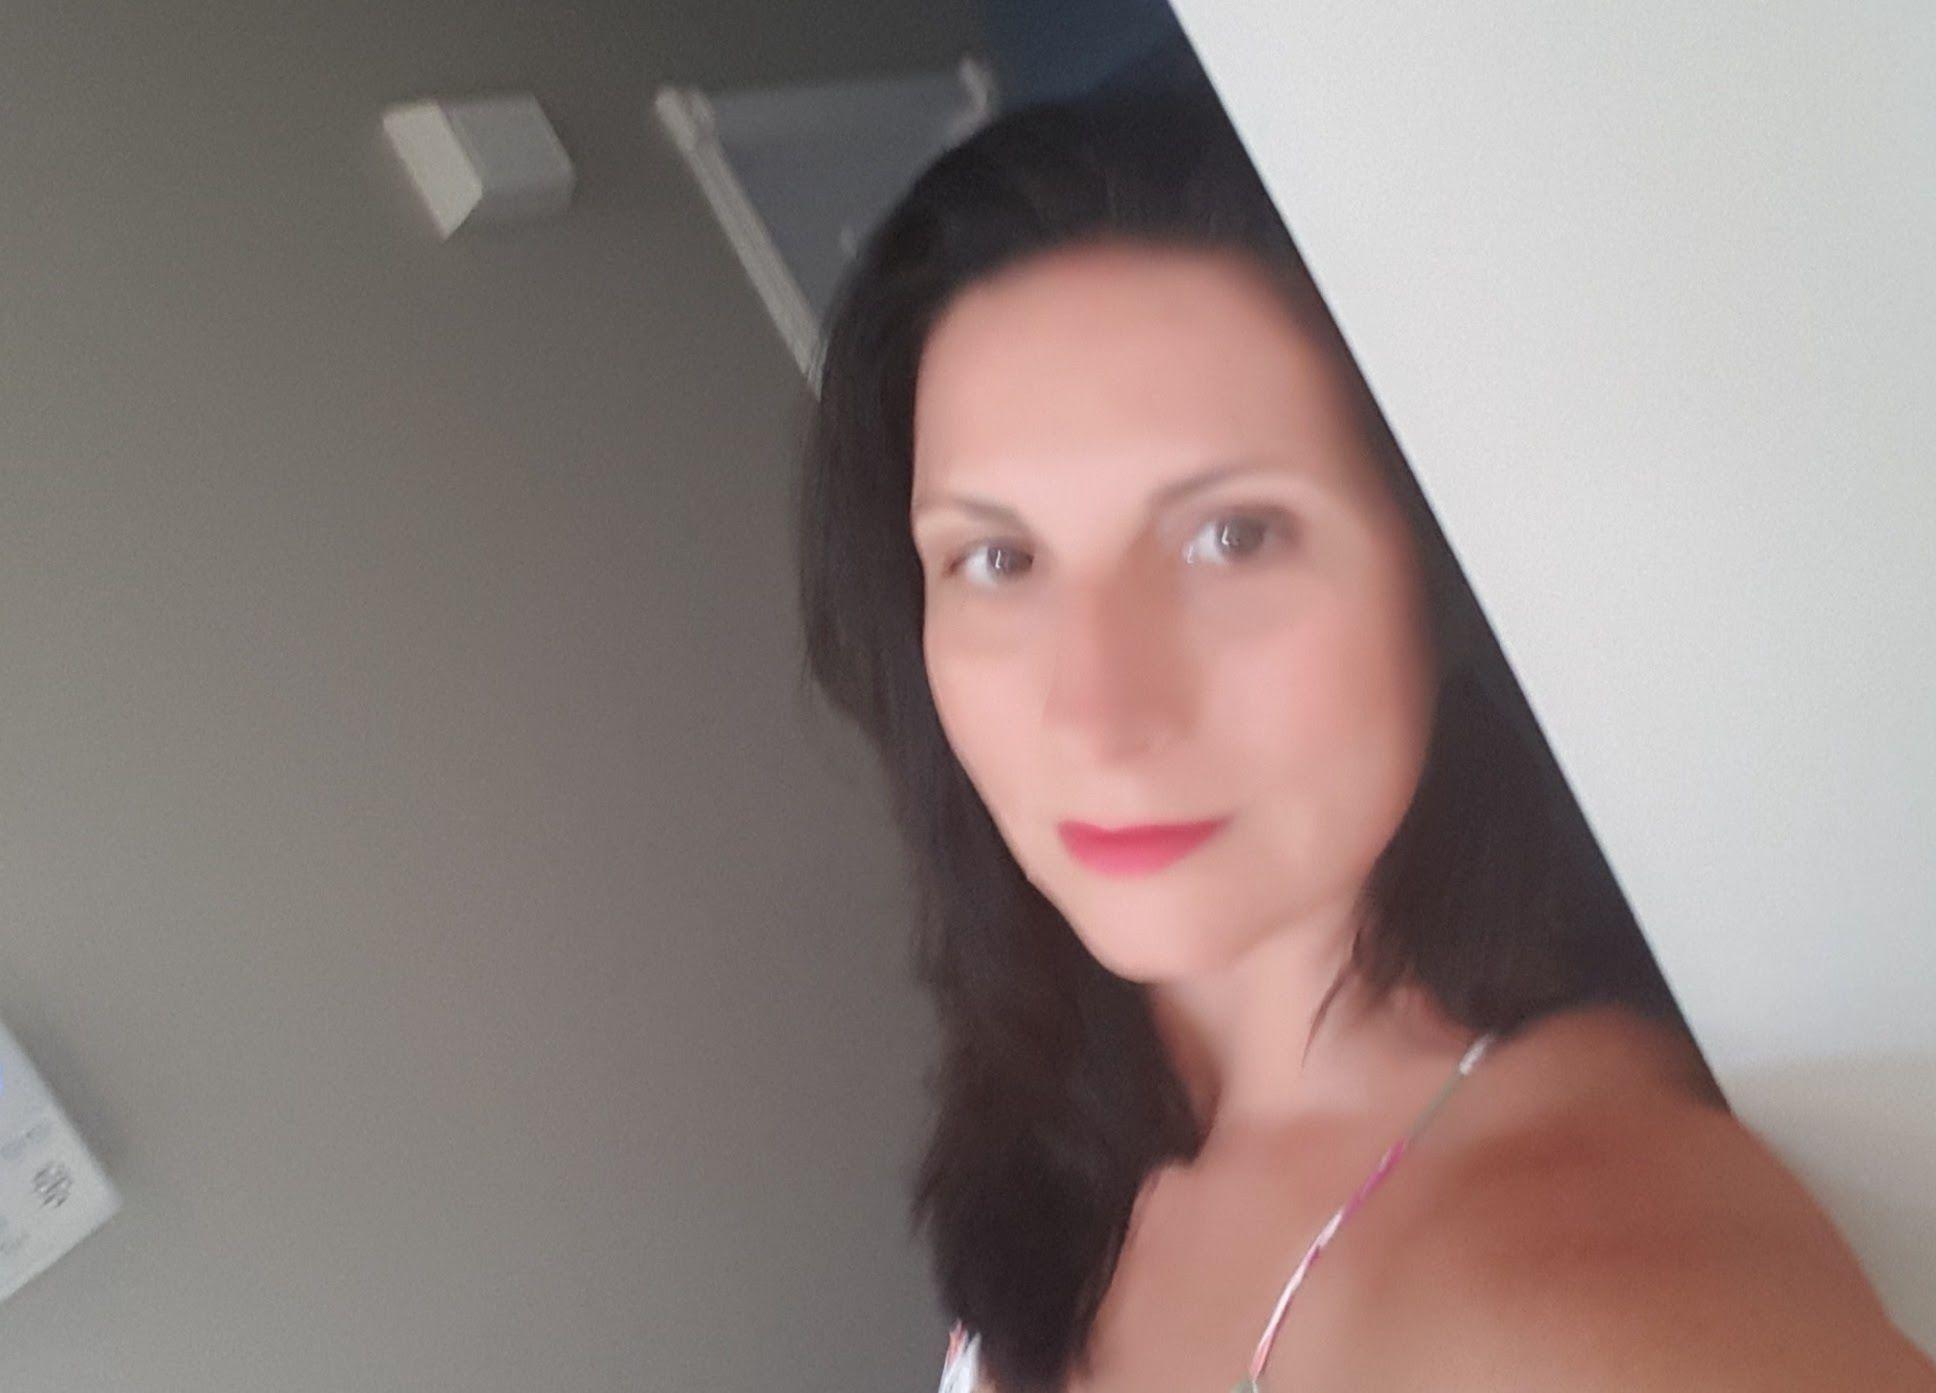 meet cambridge singles Online dating in cambridge is the best way to meet new people in cambridge urbansocial specialises in cambridge dating with over 2 million active single members looking for love online.